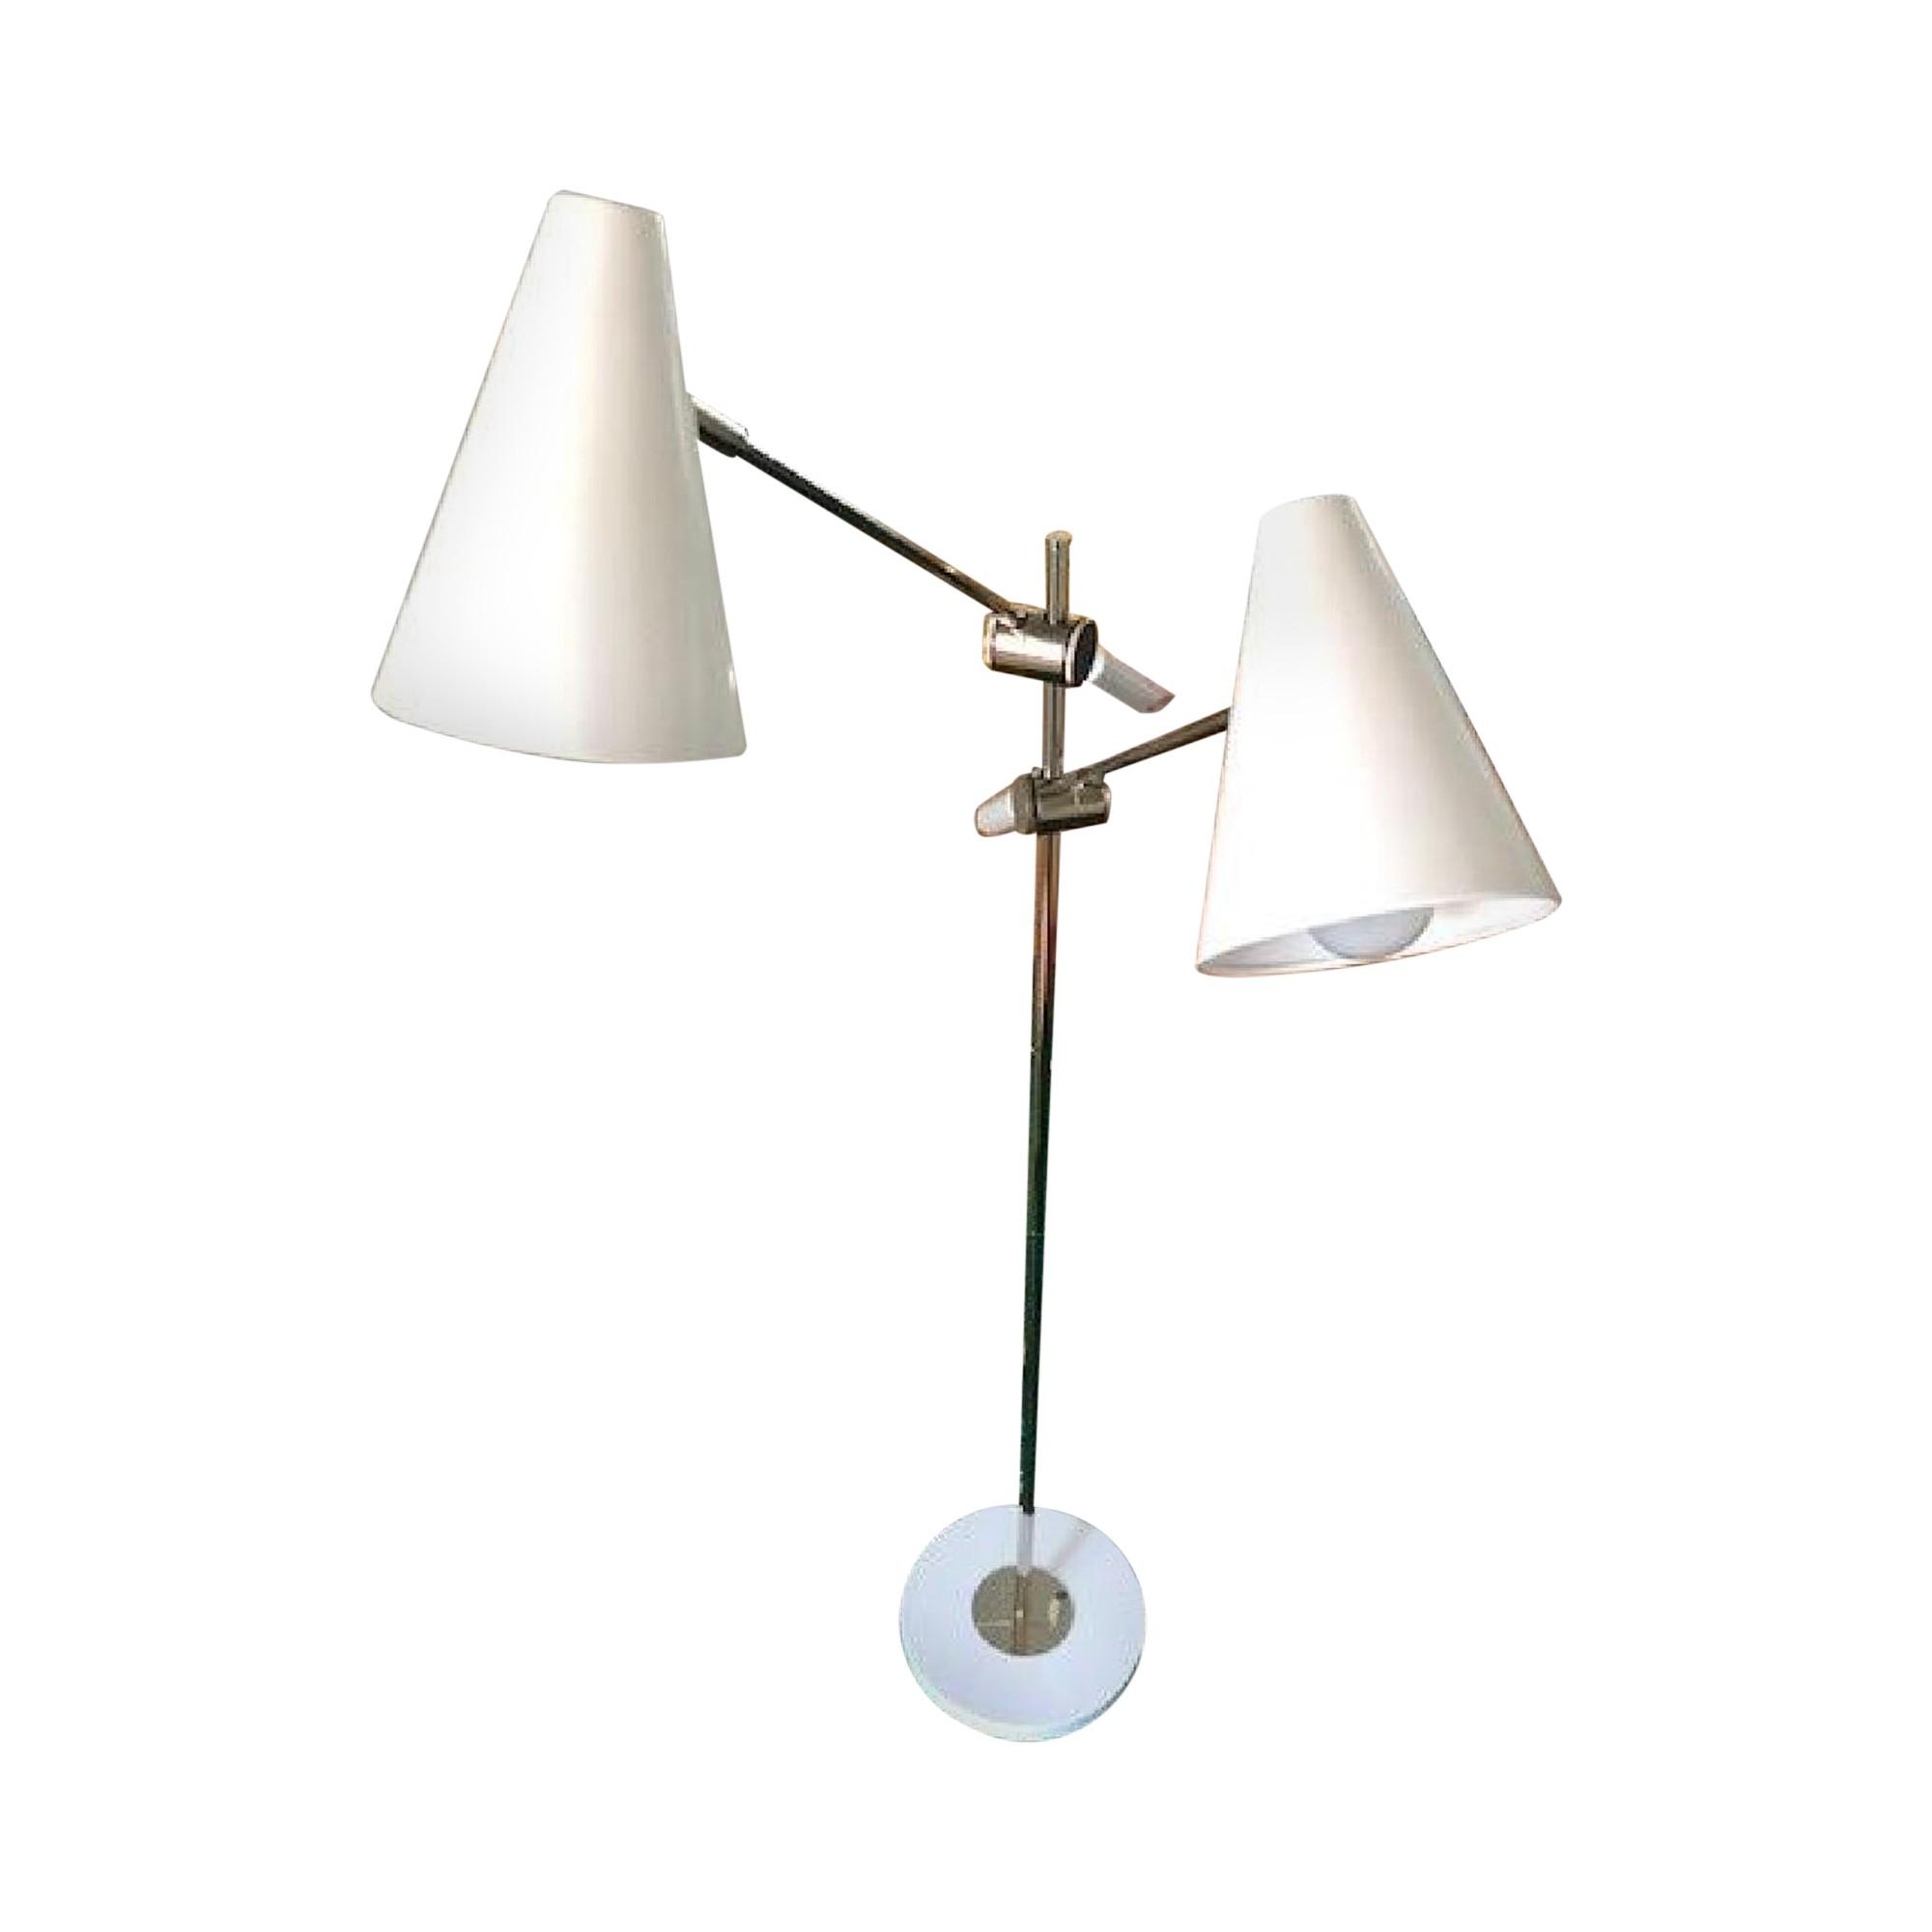 Luminaire Dual Light Cantilevered Floor Lamp